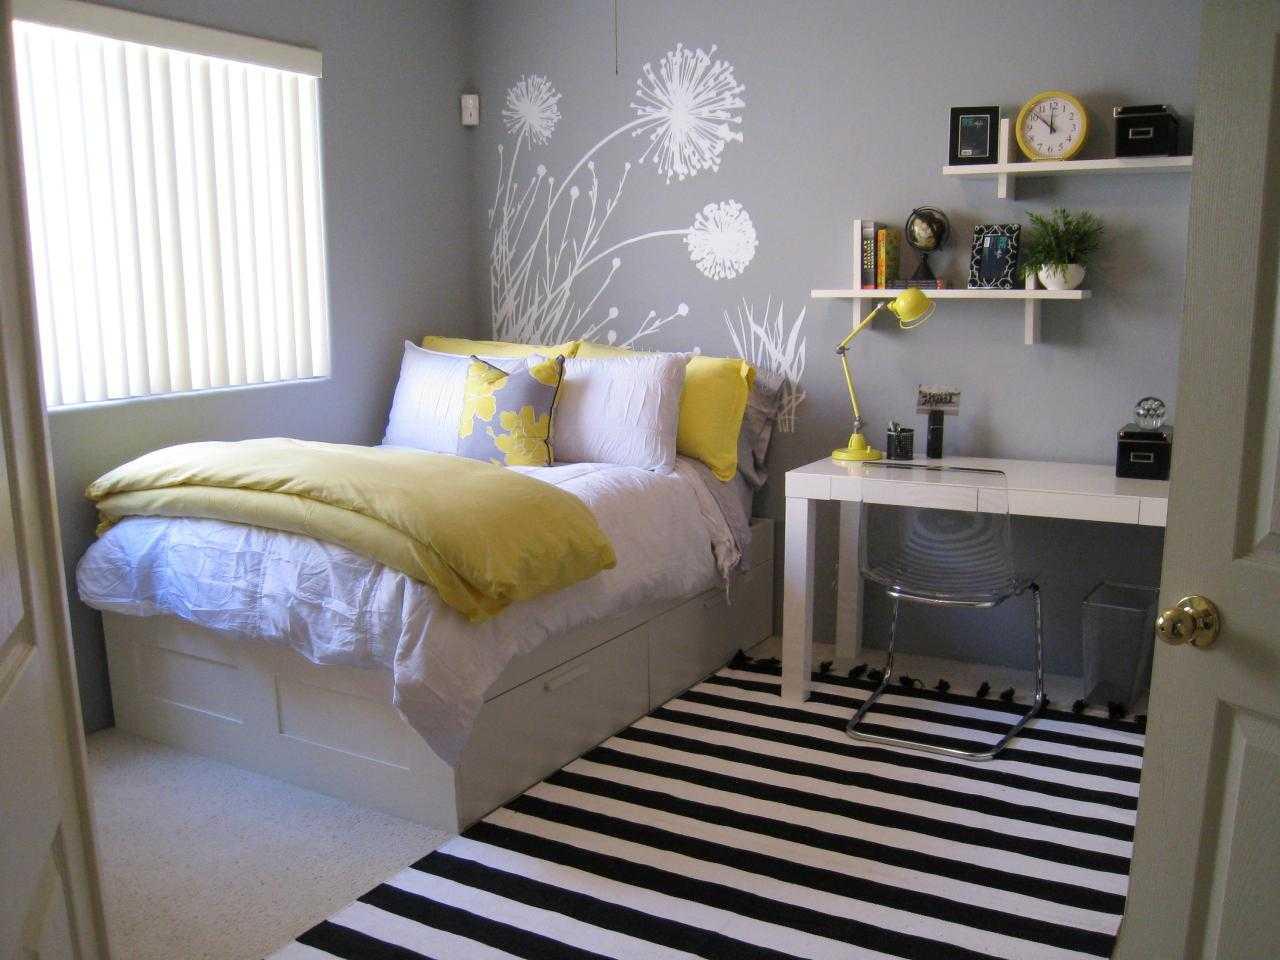 25 dise os que har n inspirarte para decorar tu habitaci n - Como decorar un cuarto ...